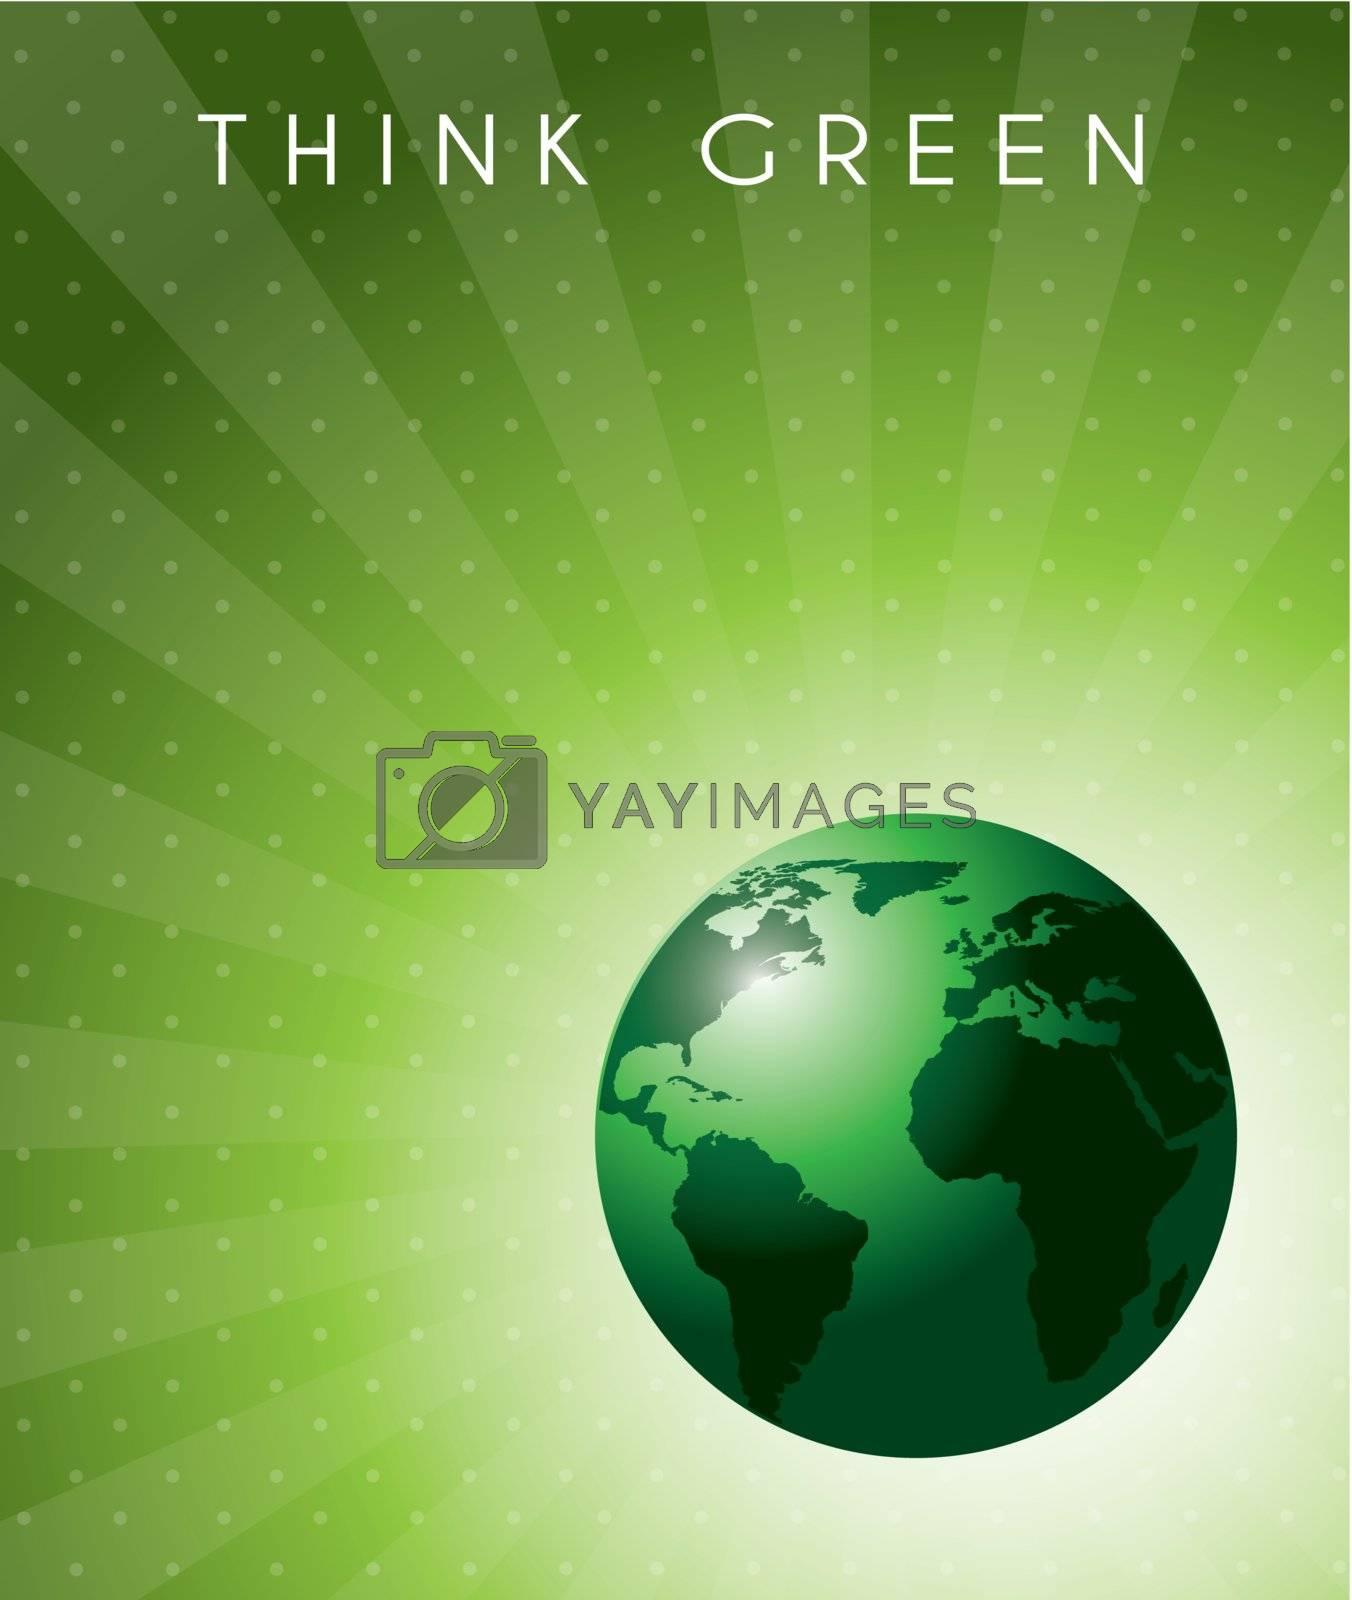 Think green background over lines background vector illustration